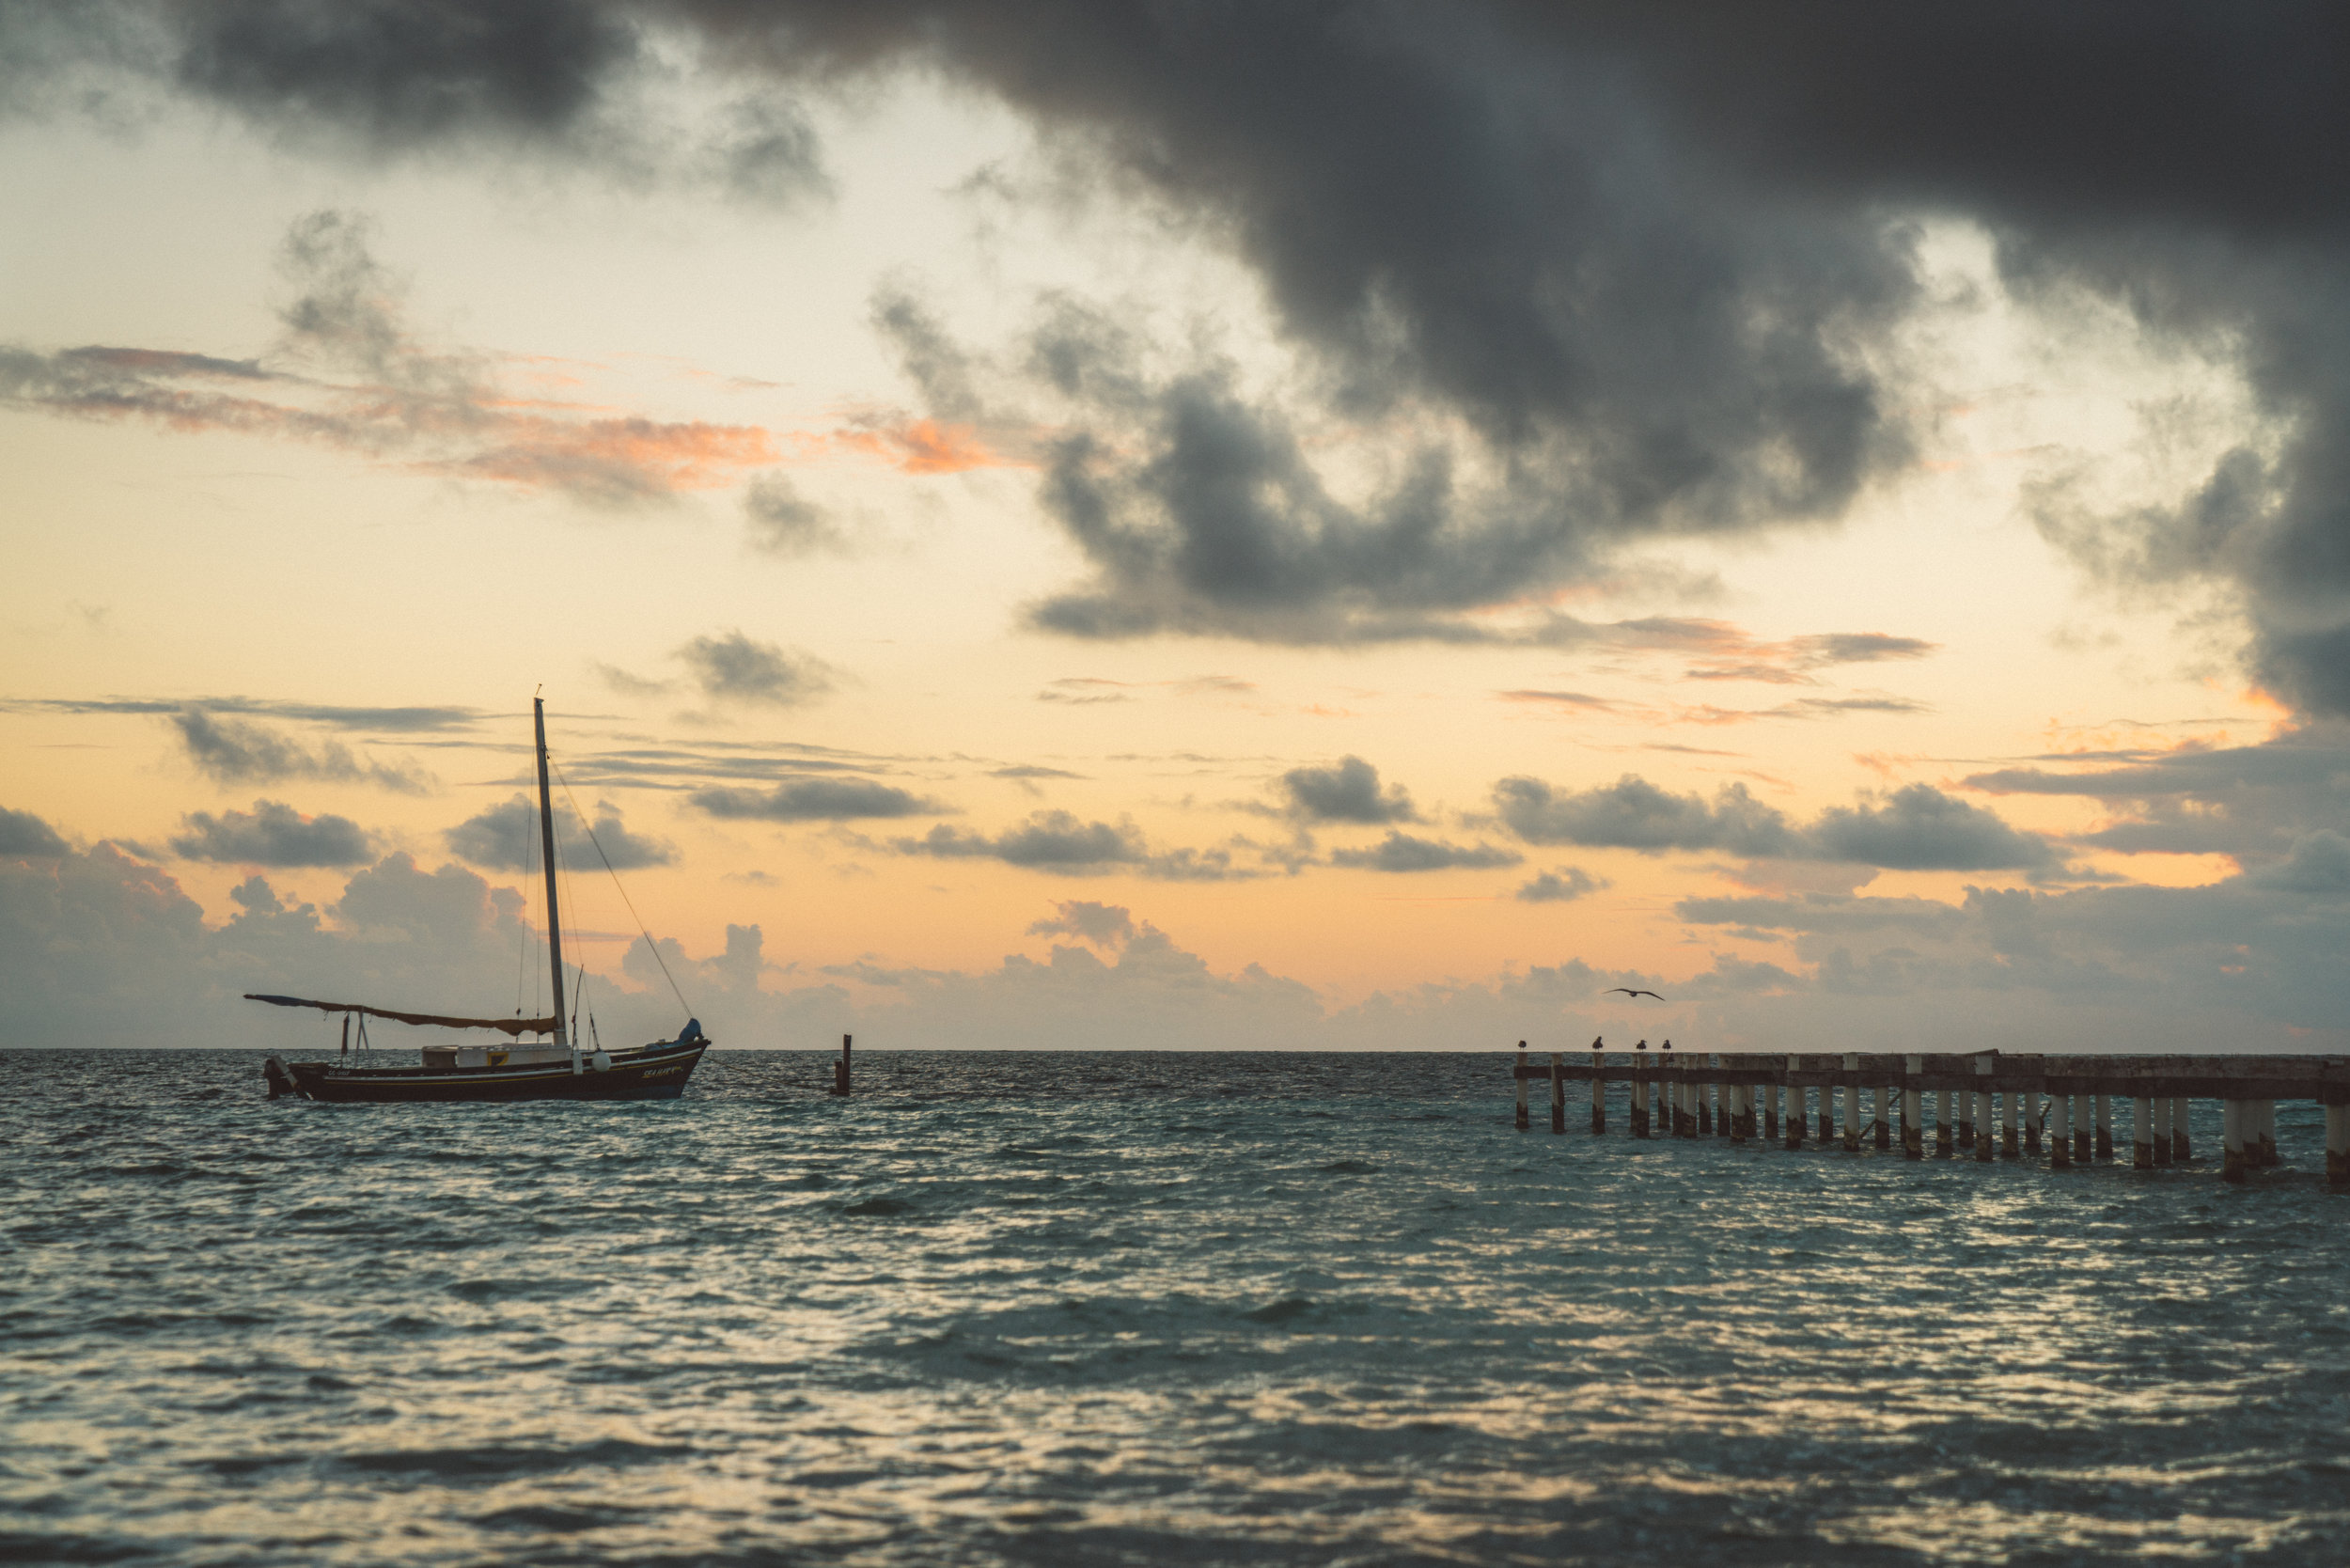 One of the many docks on Caye Caulker seen at sunrise.